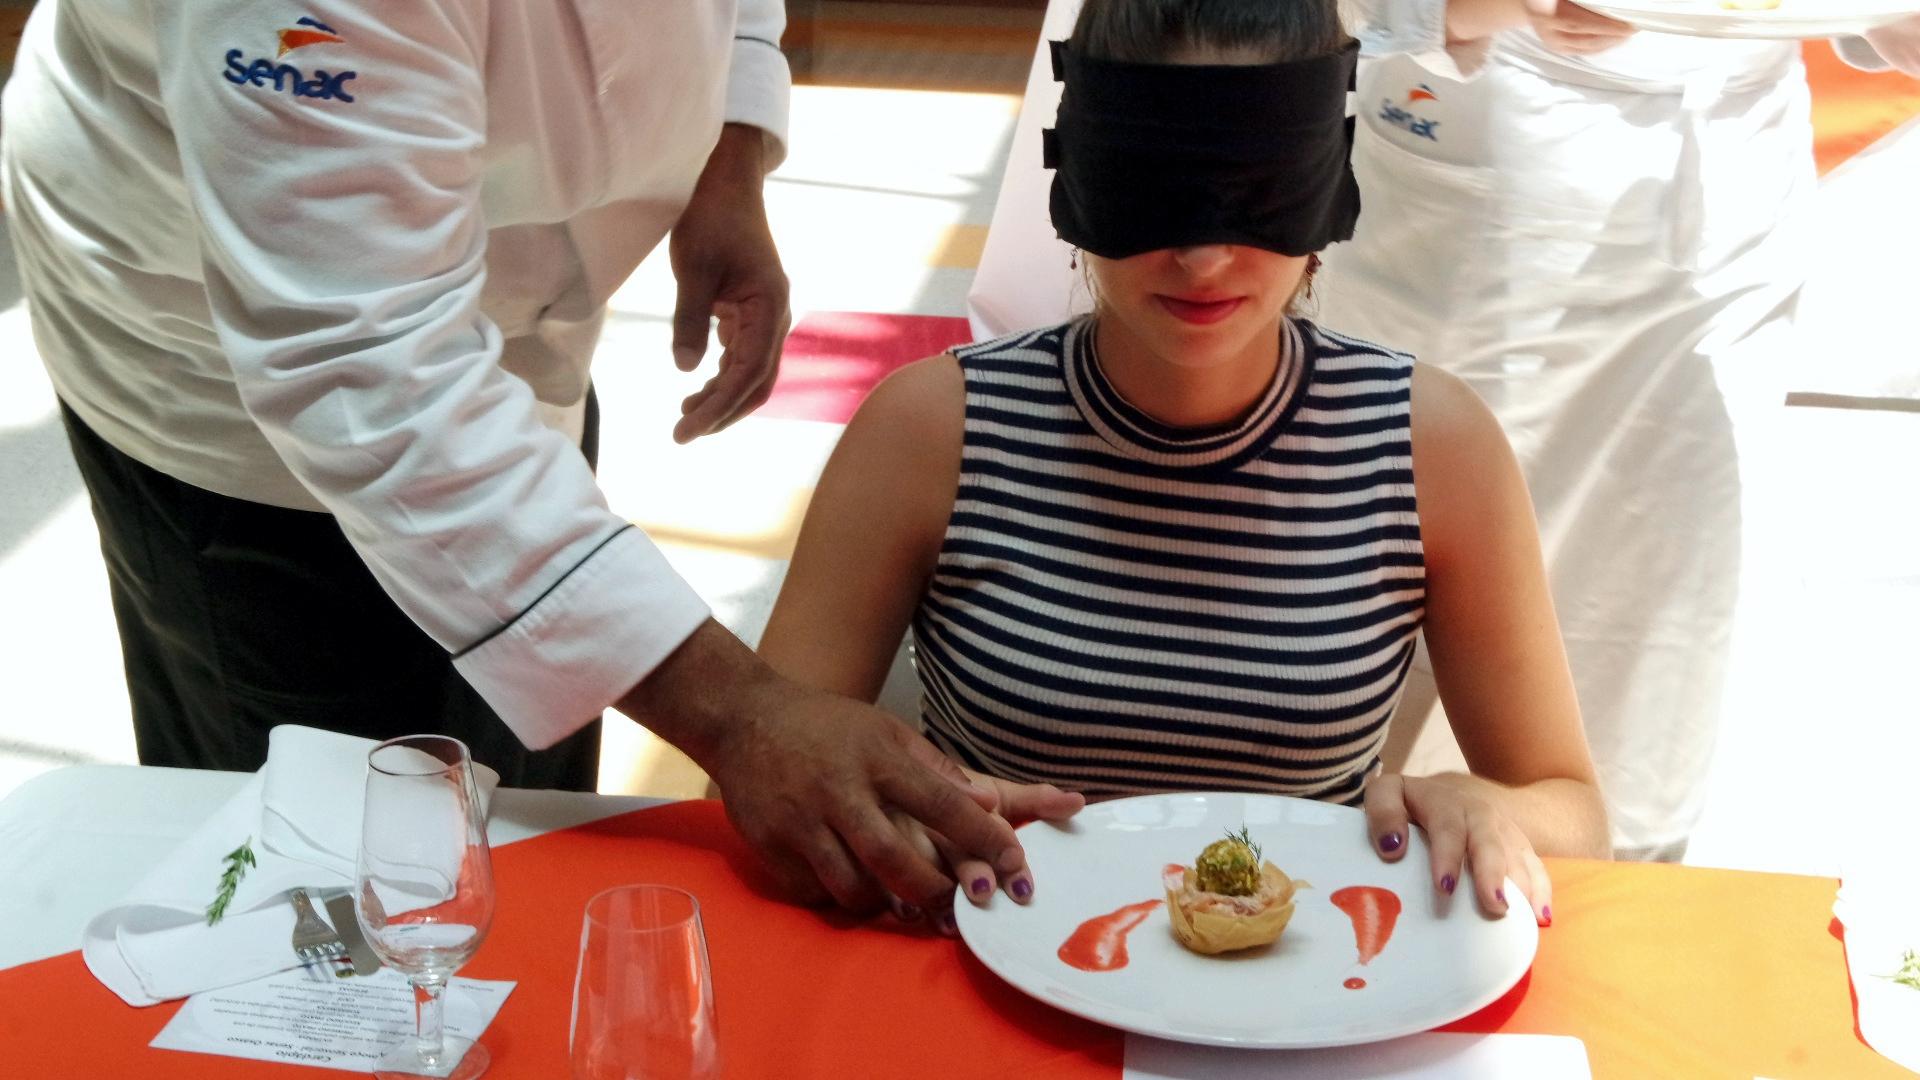 Chef Lúcio Roberto orienta uma das convidadas